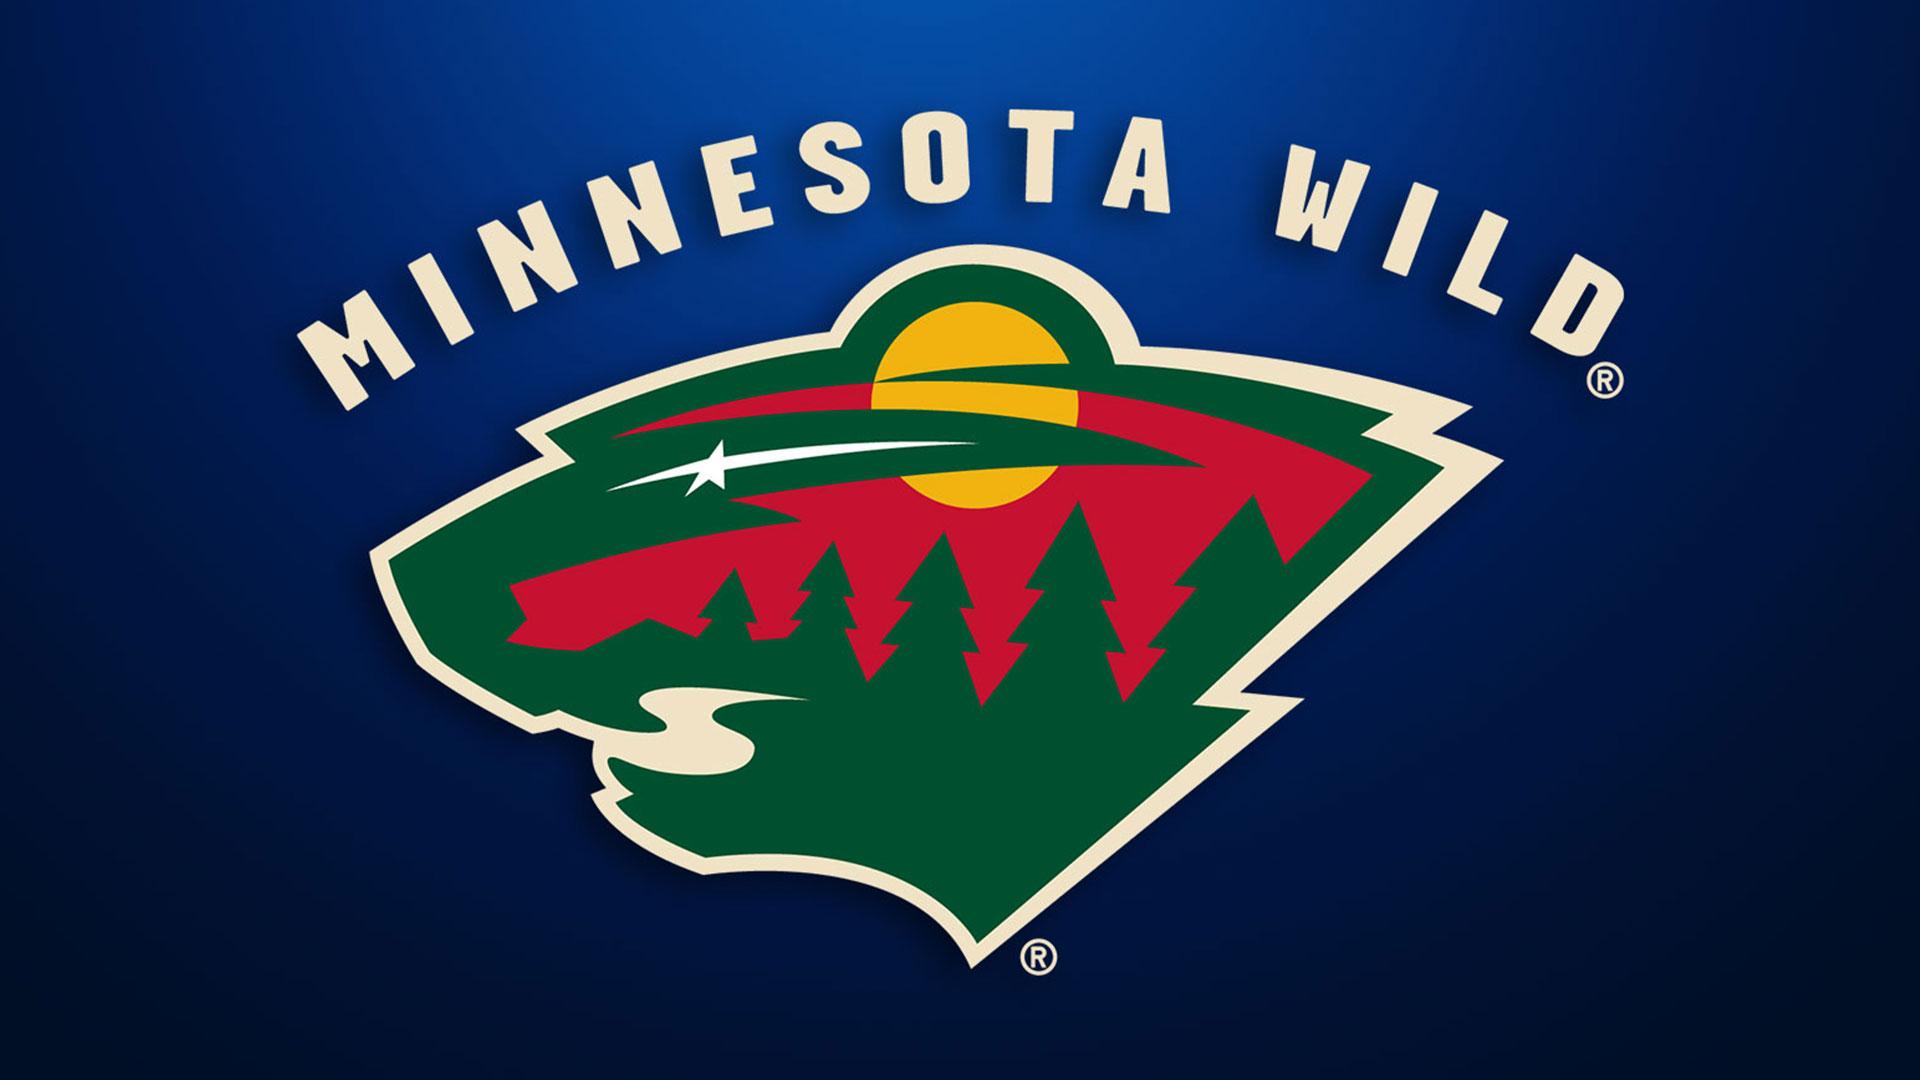 KELO Minnesota Wild2